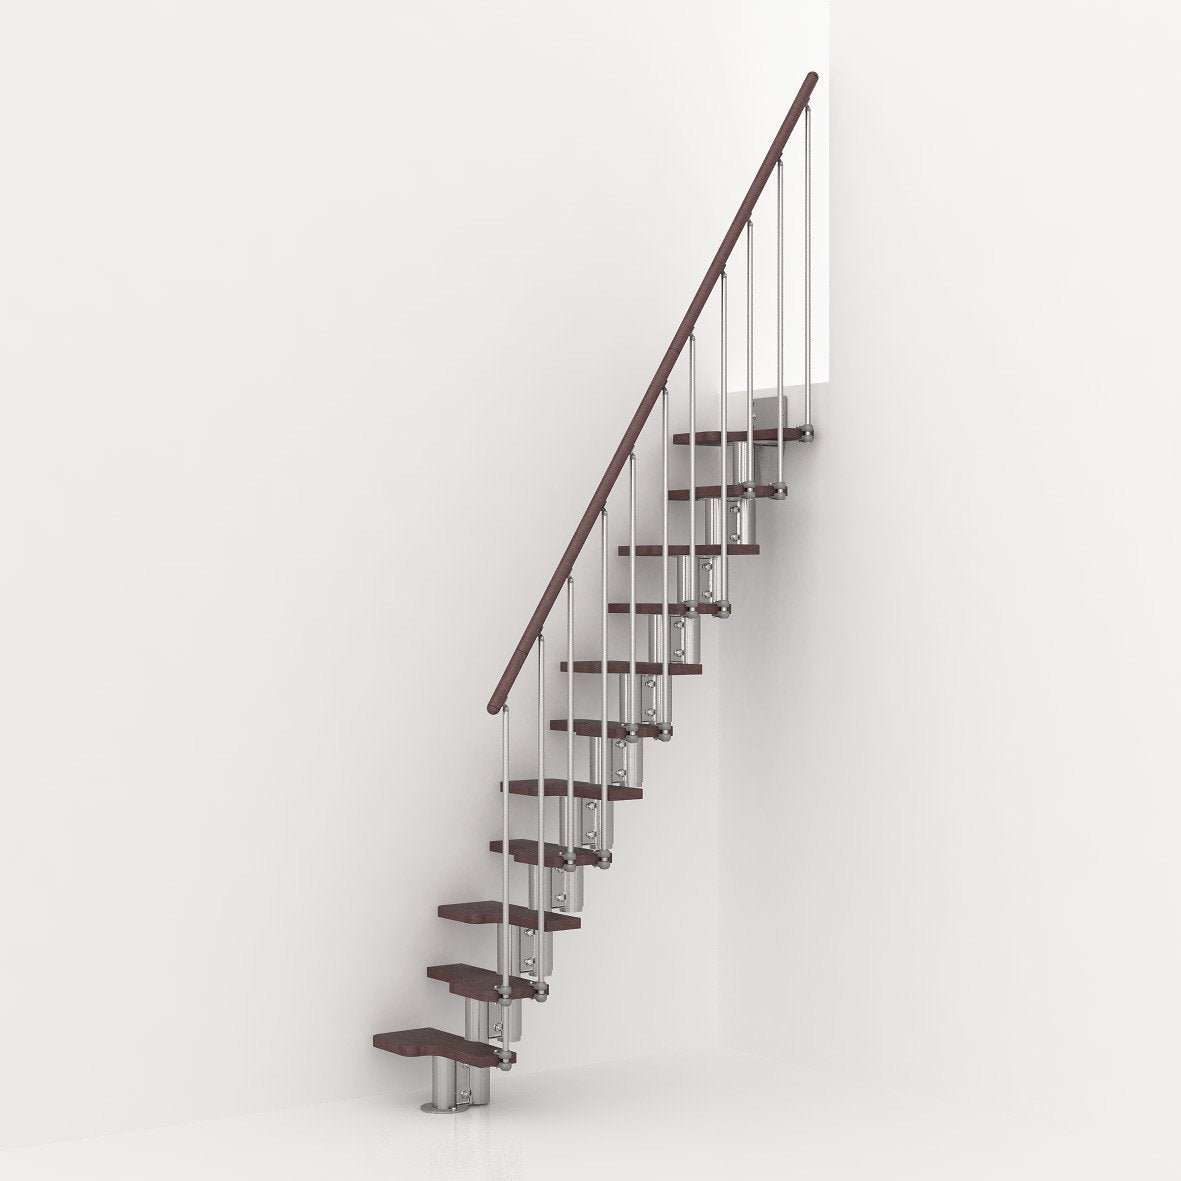 Escalier droit mini bois m tal chrom leroy merlin - Escalier droit metal ...